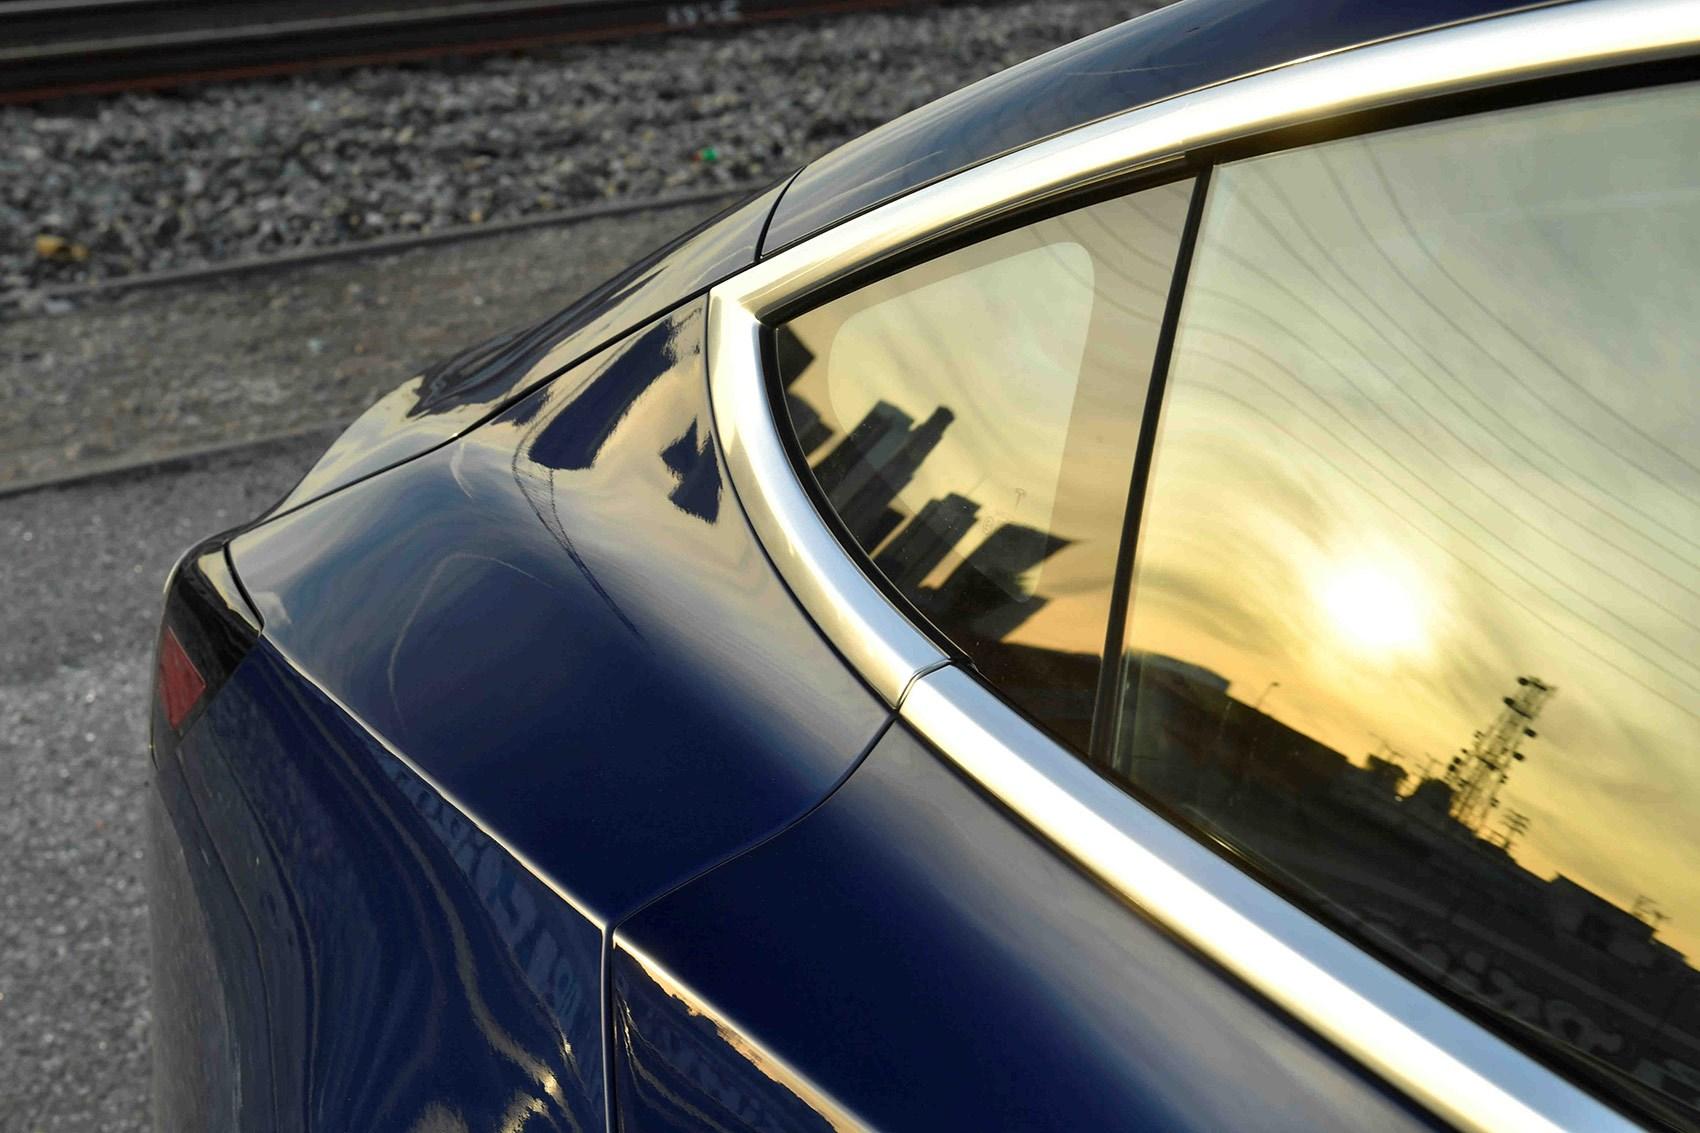 Tesla Model 3 windows